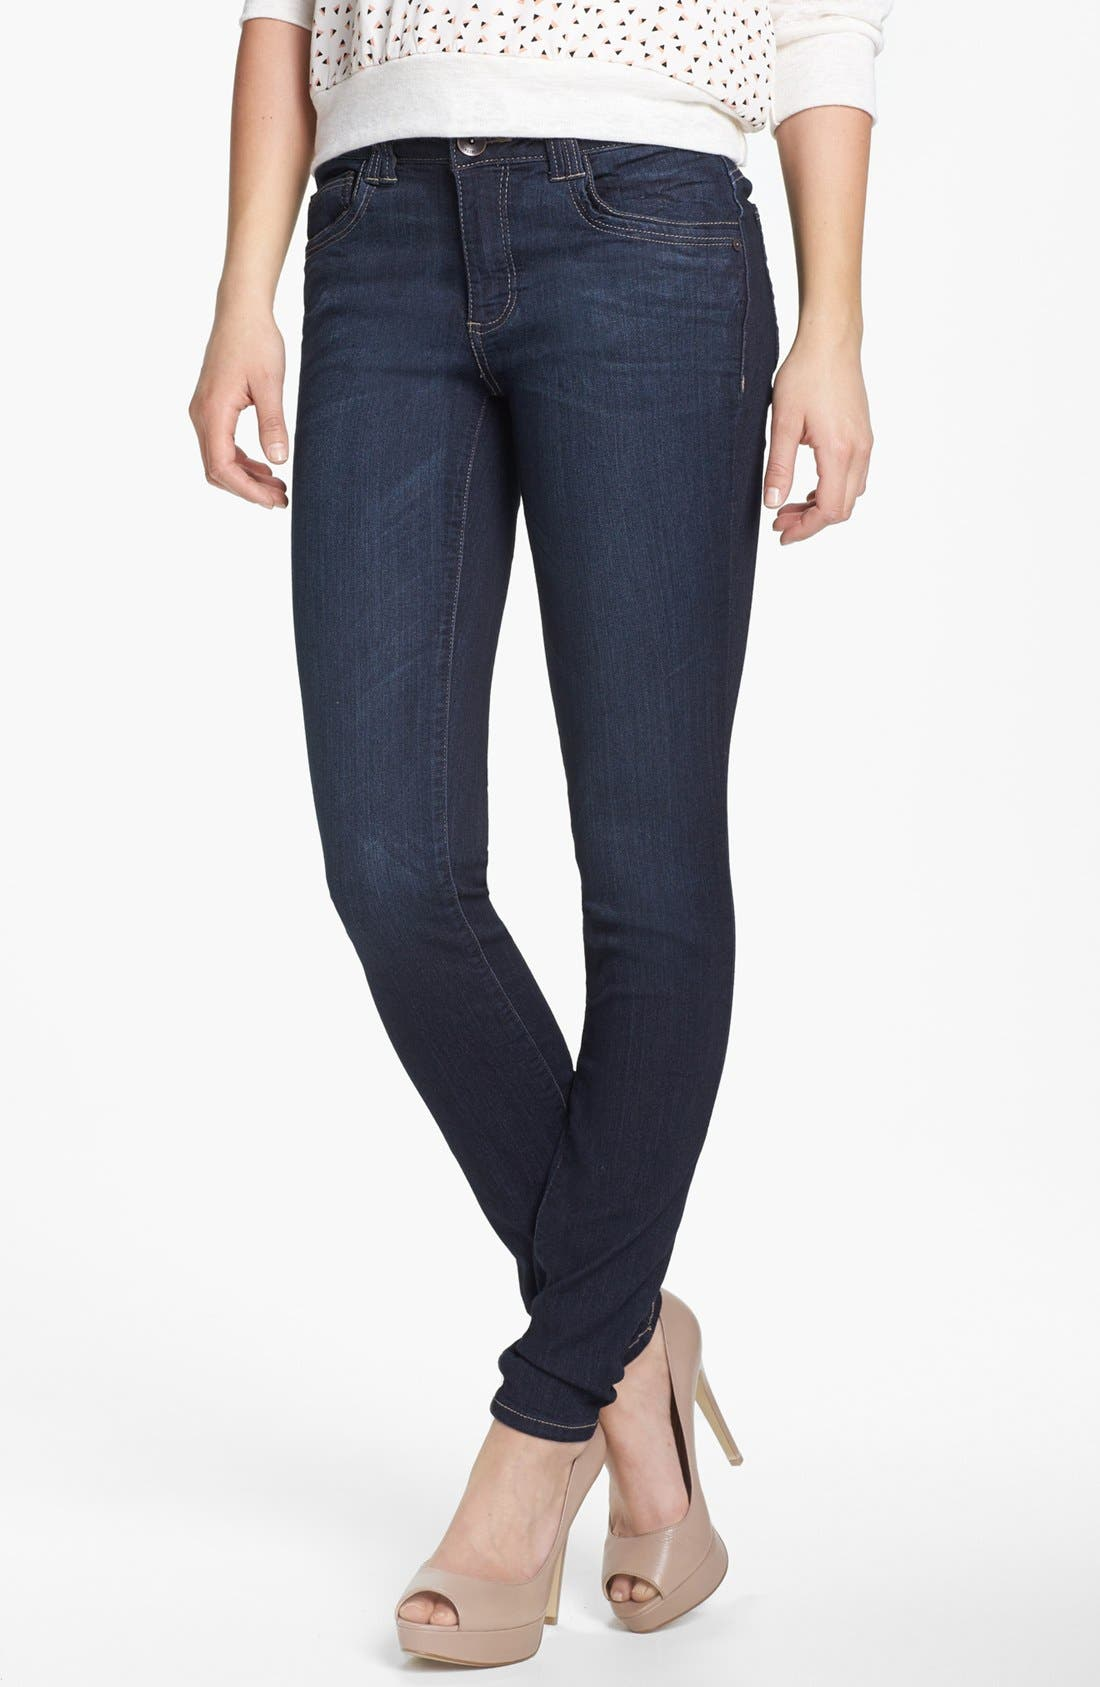 Main Image - Wit & Wisdom Skinny Jeans (Indigo) (Nordstrom Exclusive)